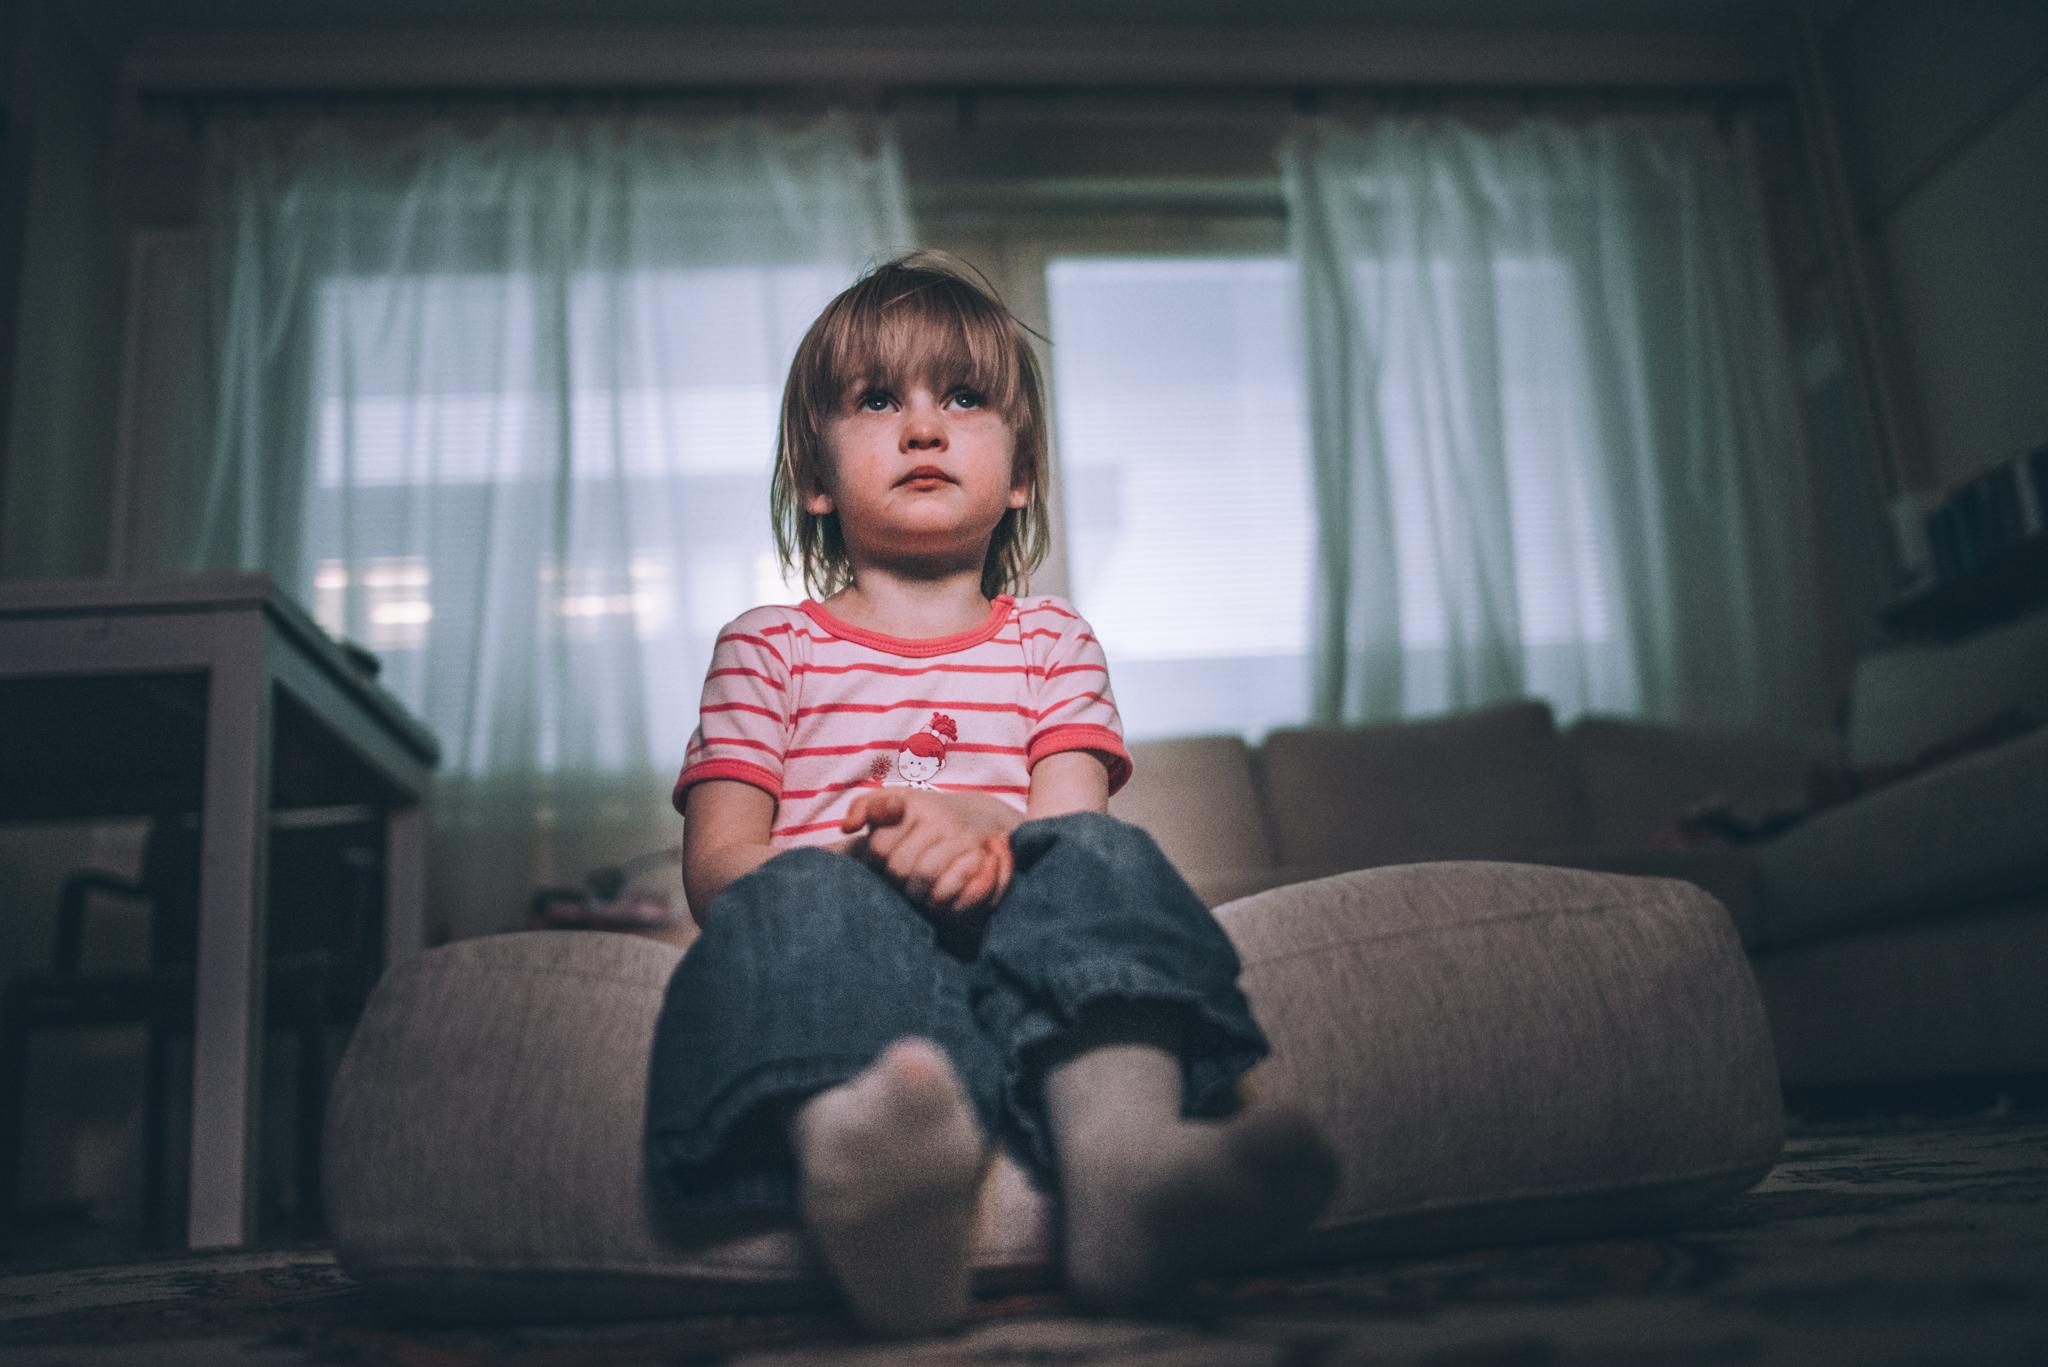 Child sitting and watching tv